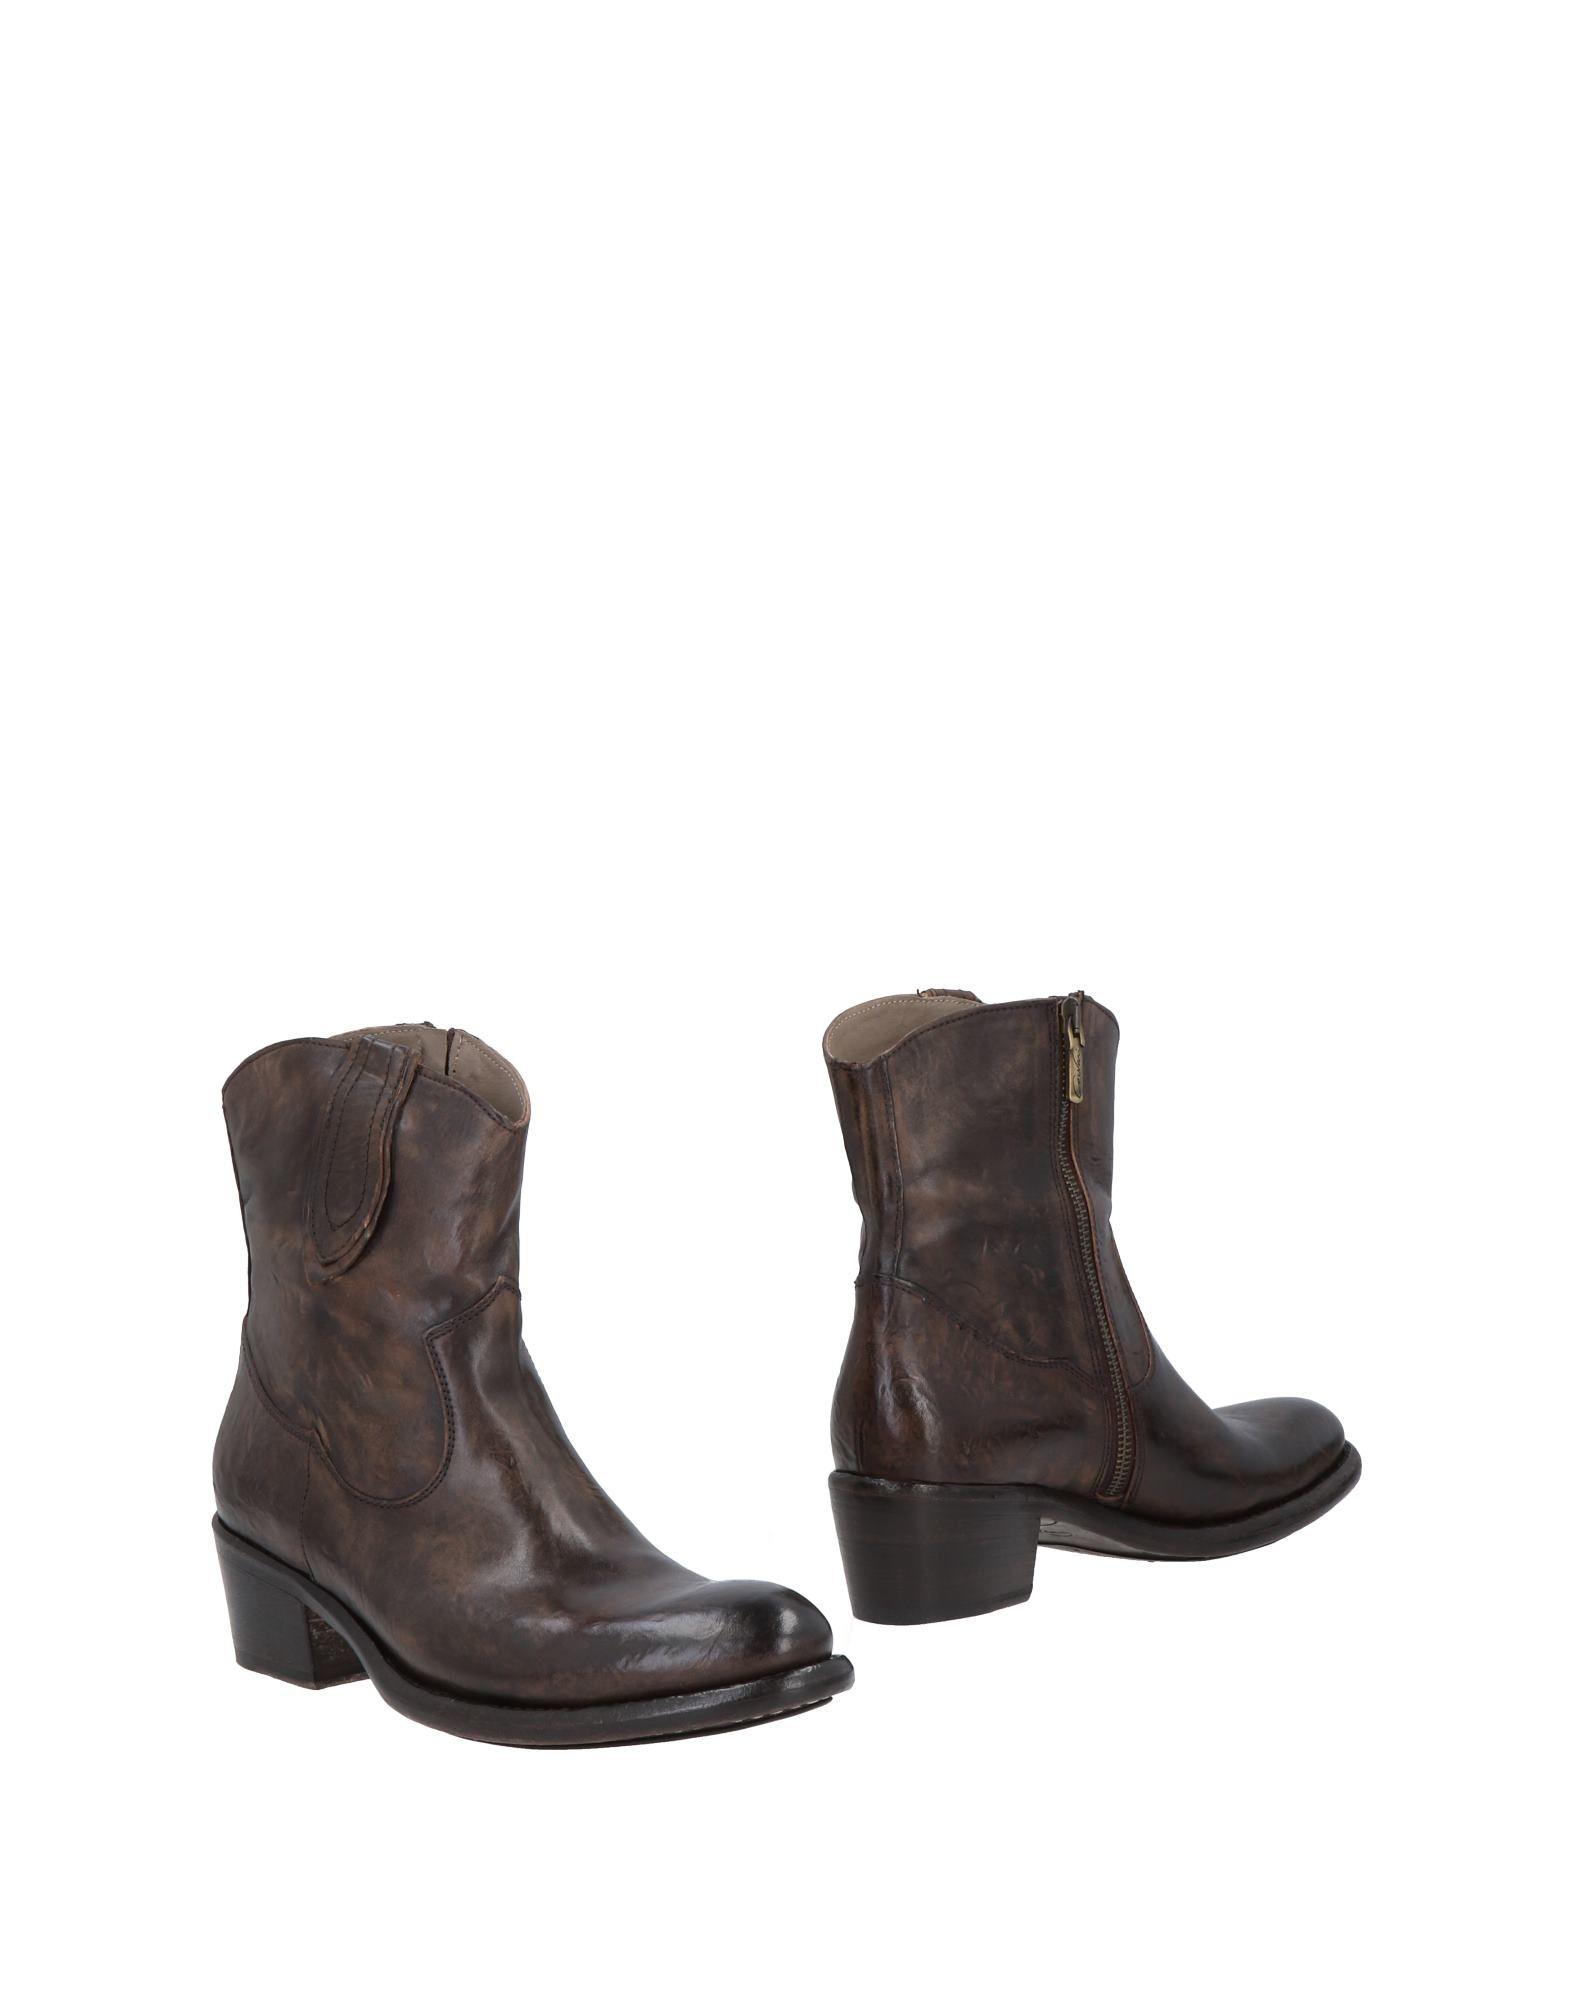 Stilvolle billige Schuhe Corvari Stiefelette 11501517IA Damen  11501517IA Stiefelette 474747